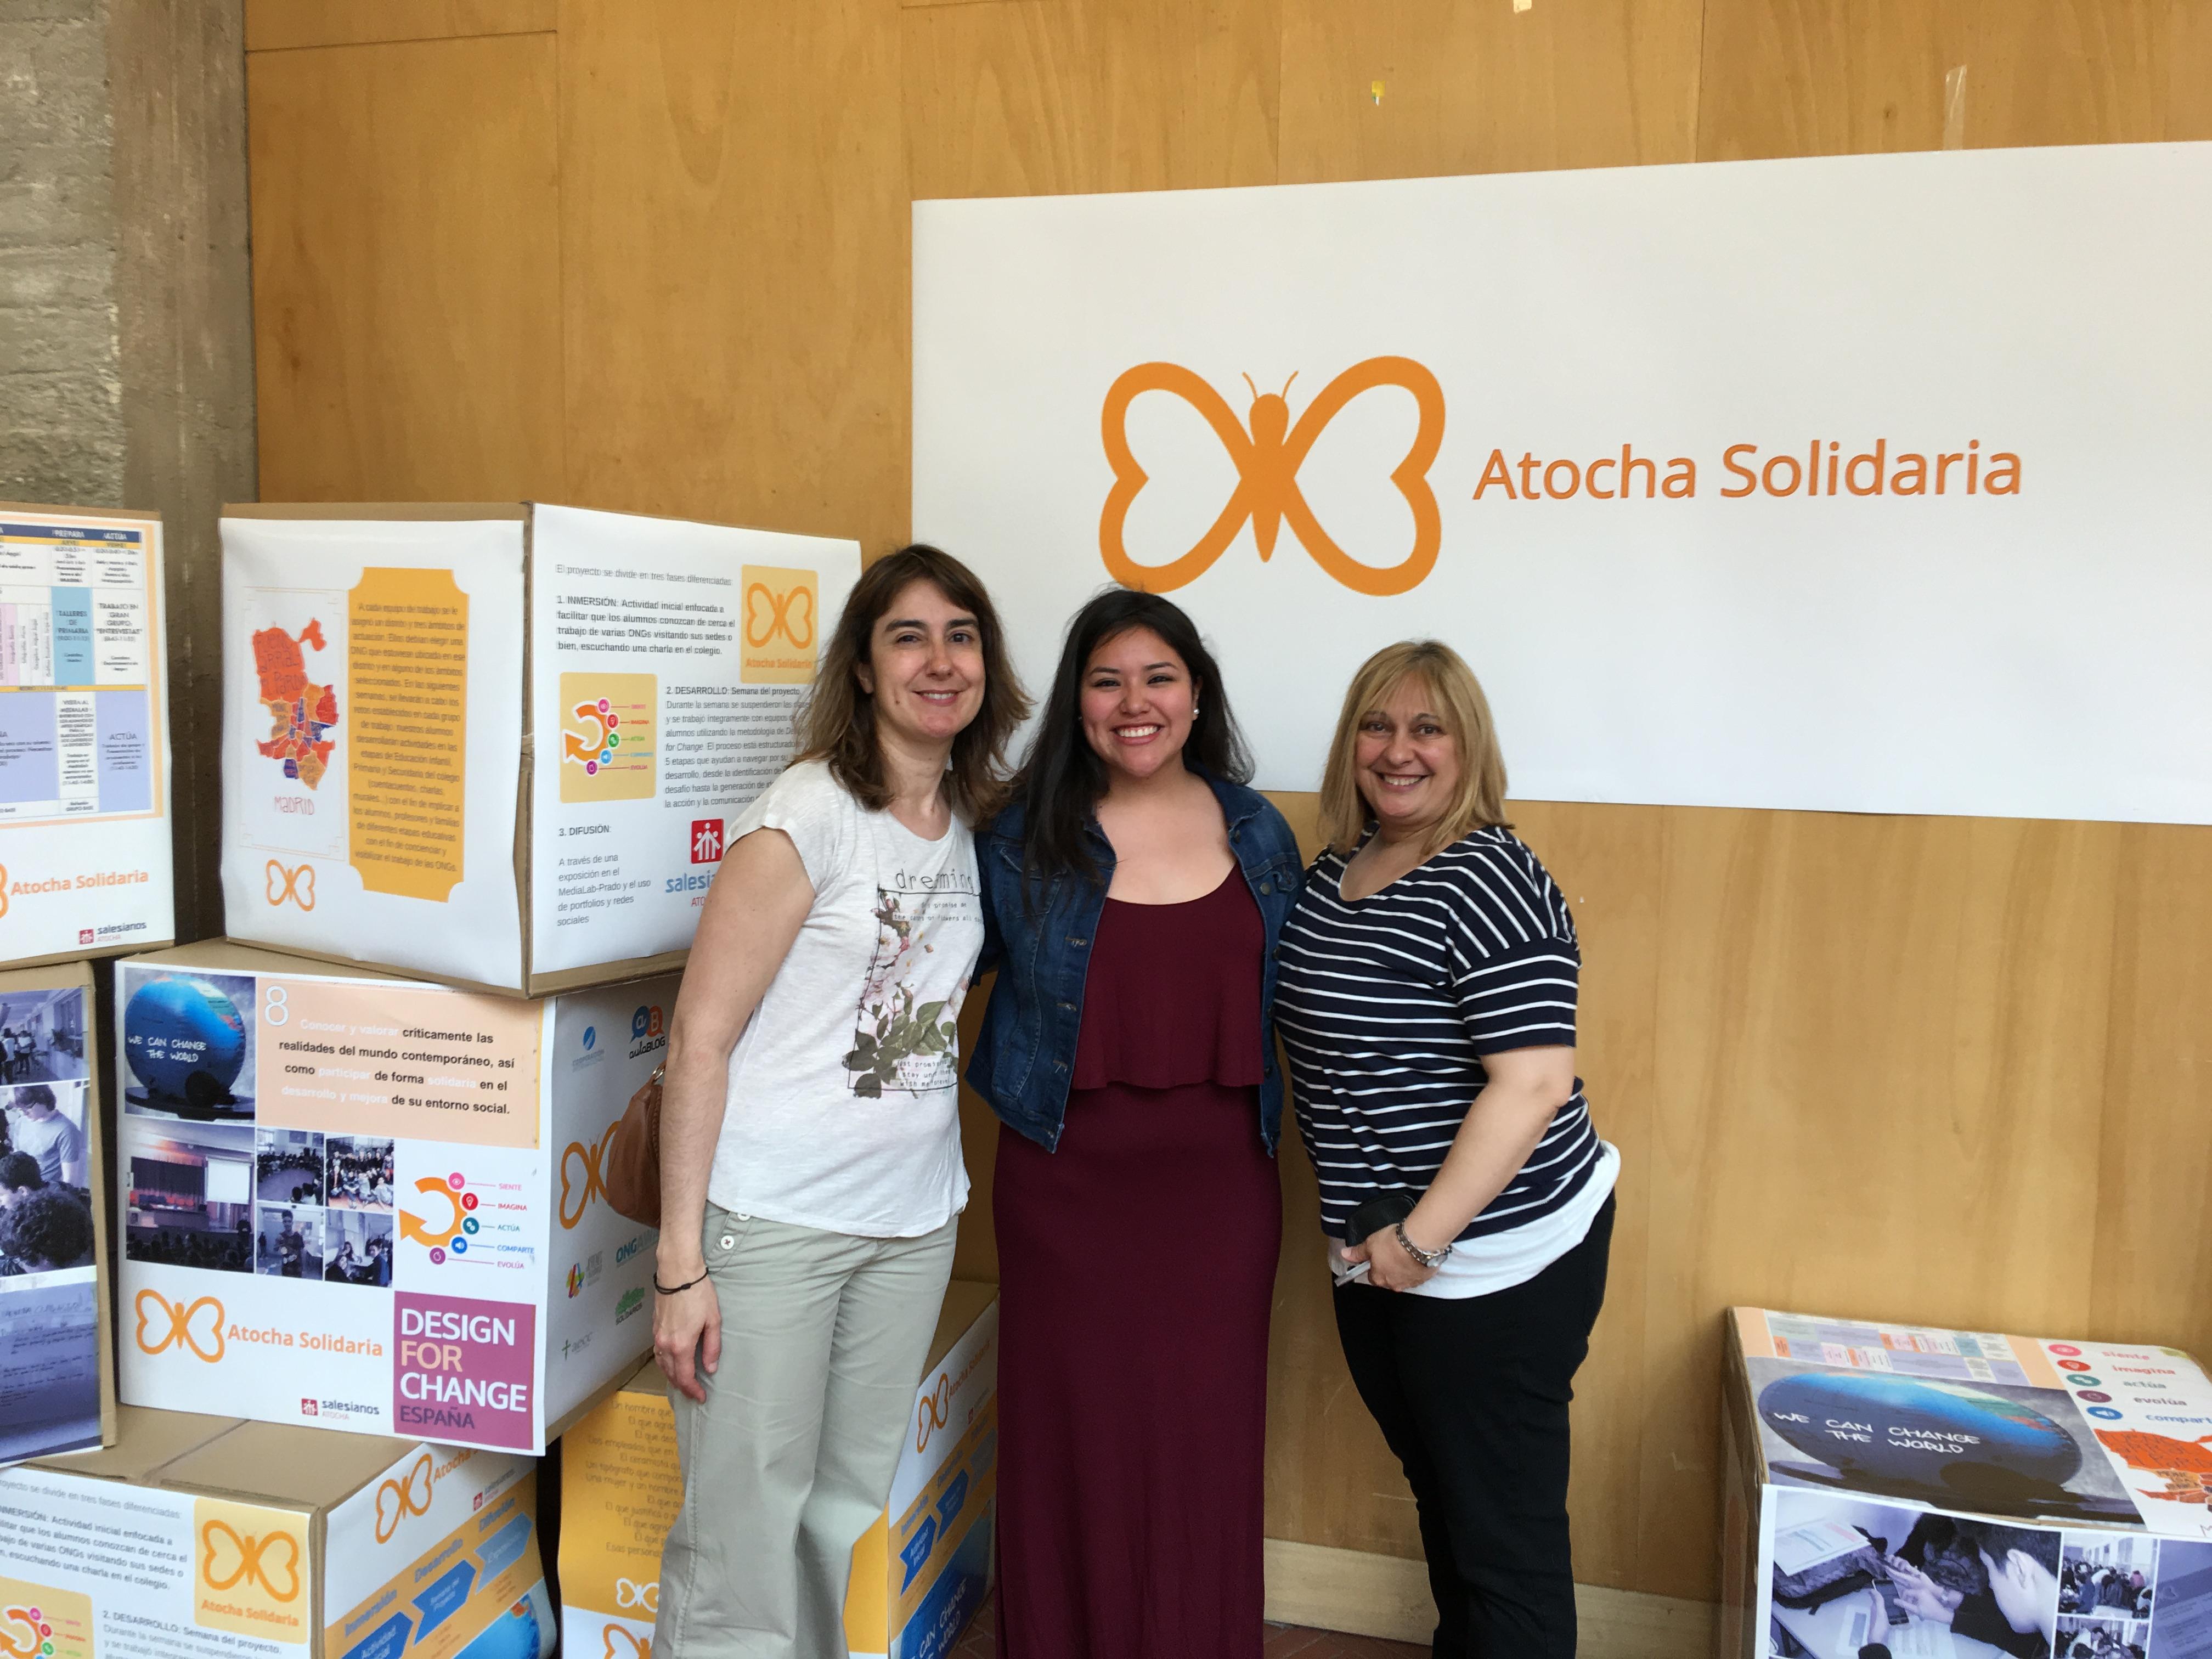 Atocha Solidaria